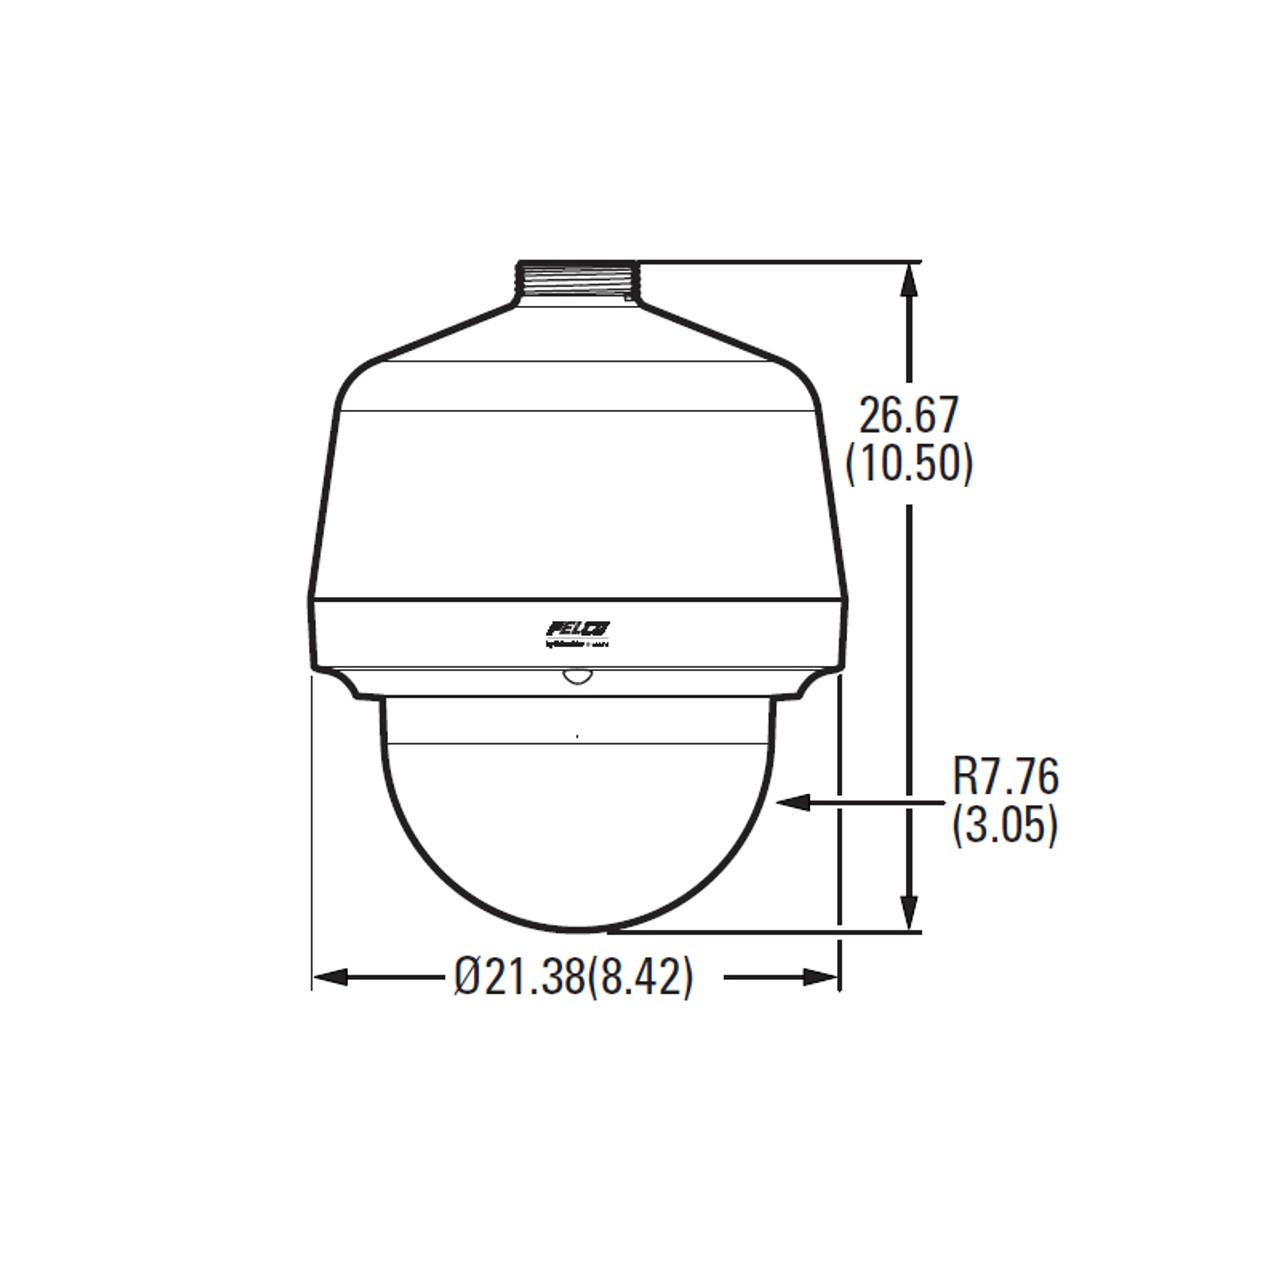 pelco ptz camera wiring diagram [ 1280 x 1280 Pixel ]